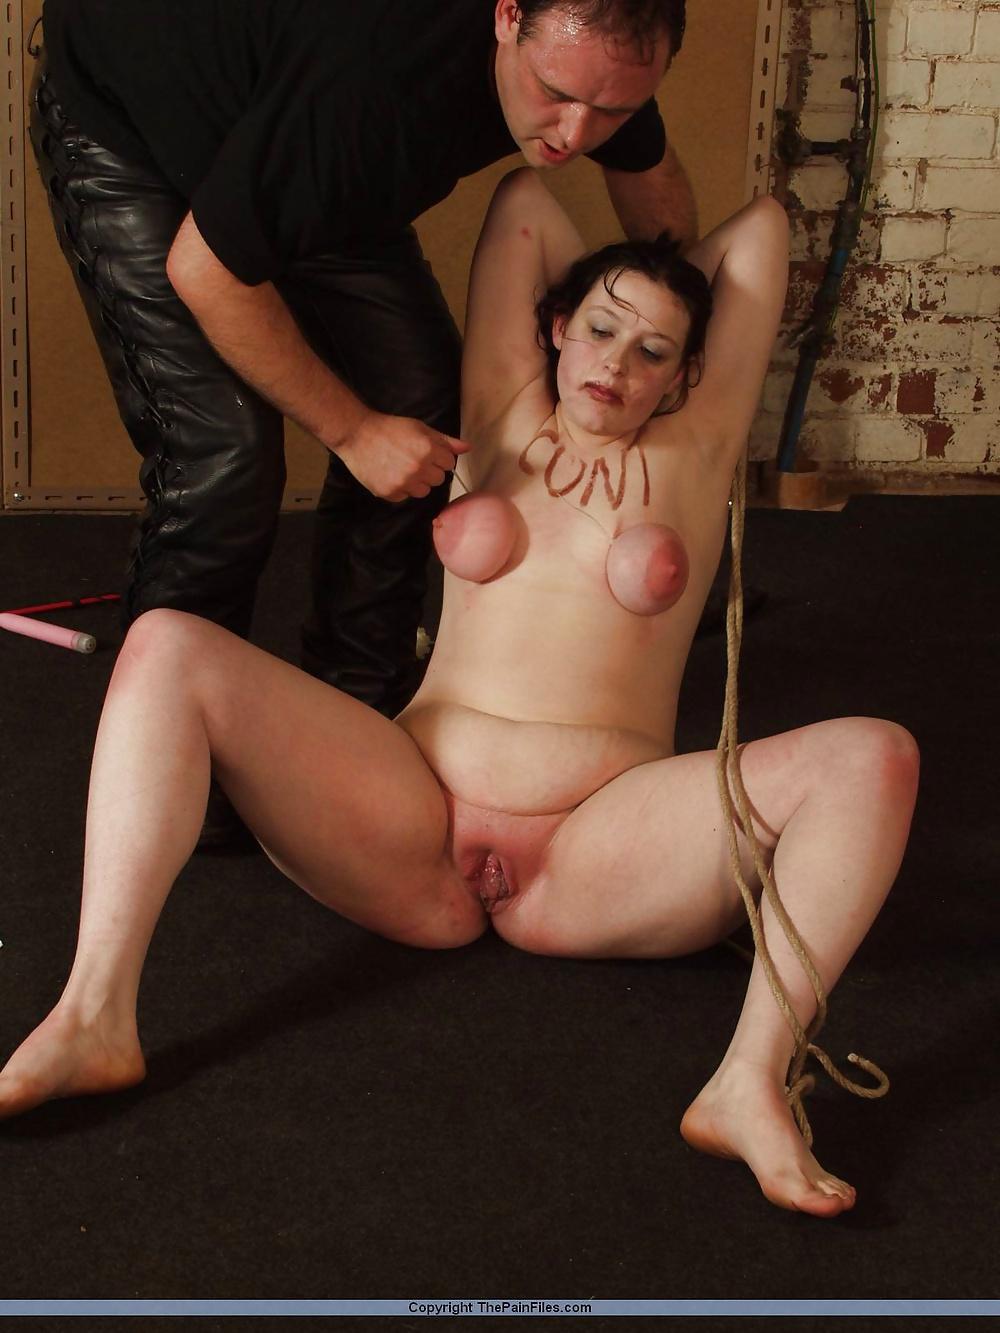 stocking-wife-sex-slave-training-classes-naked-girl